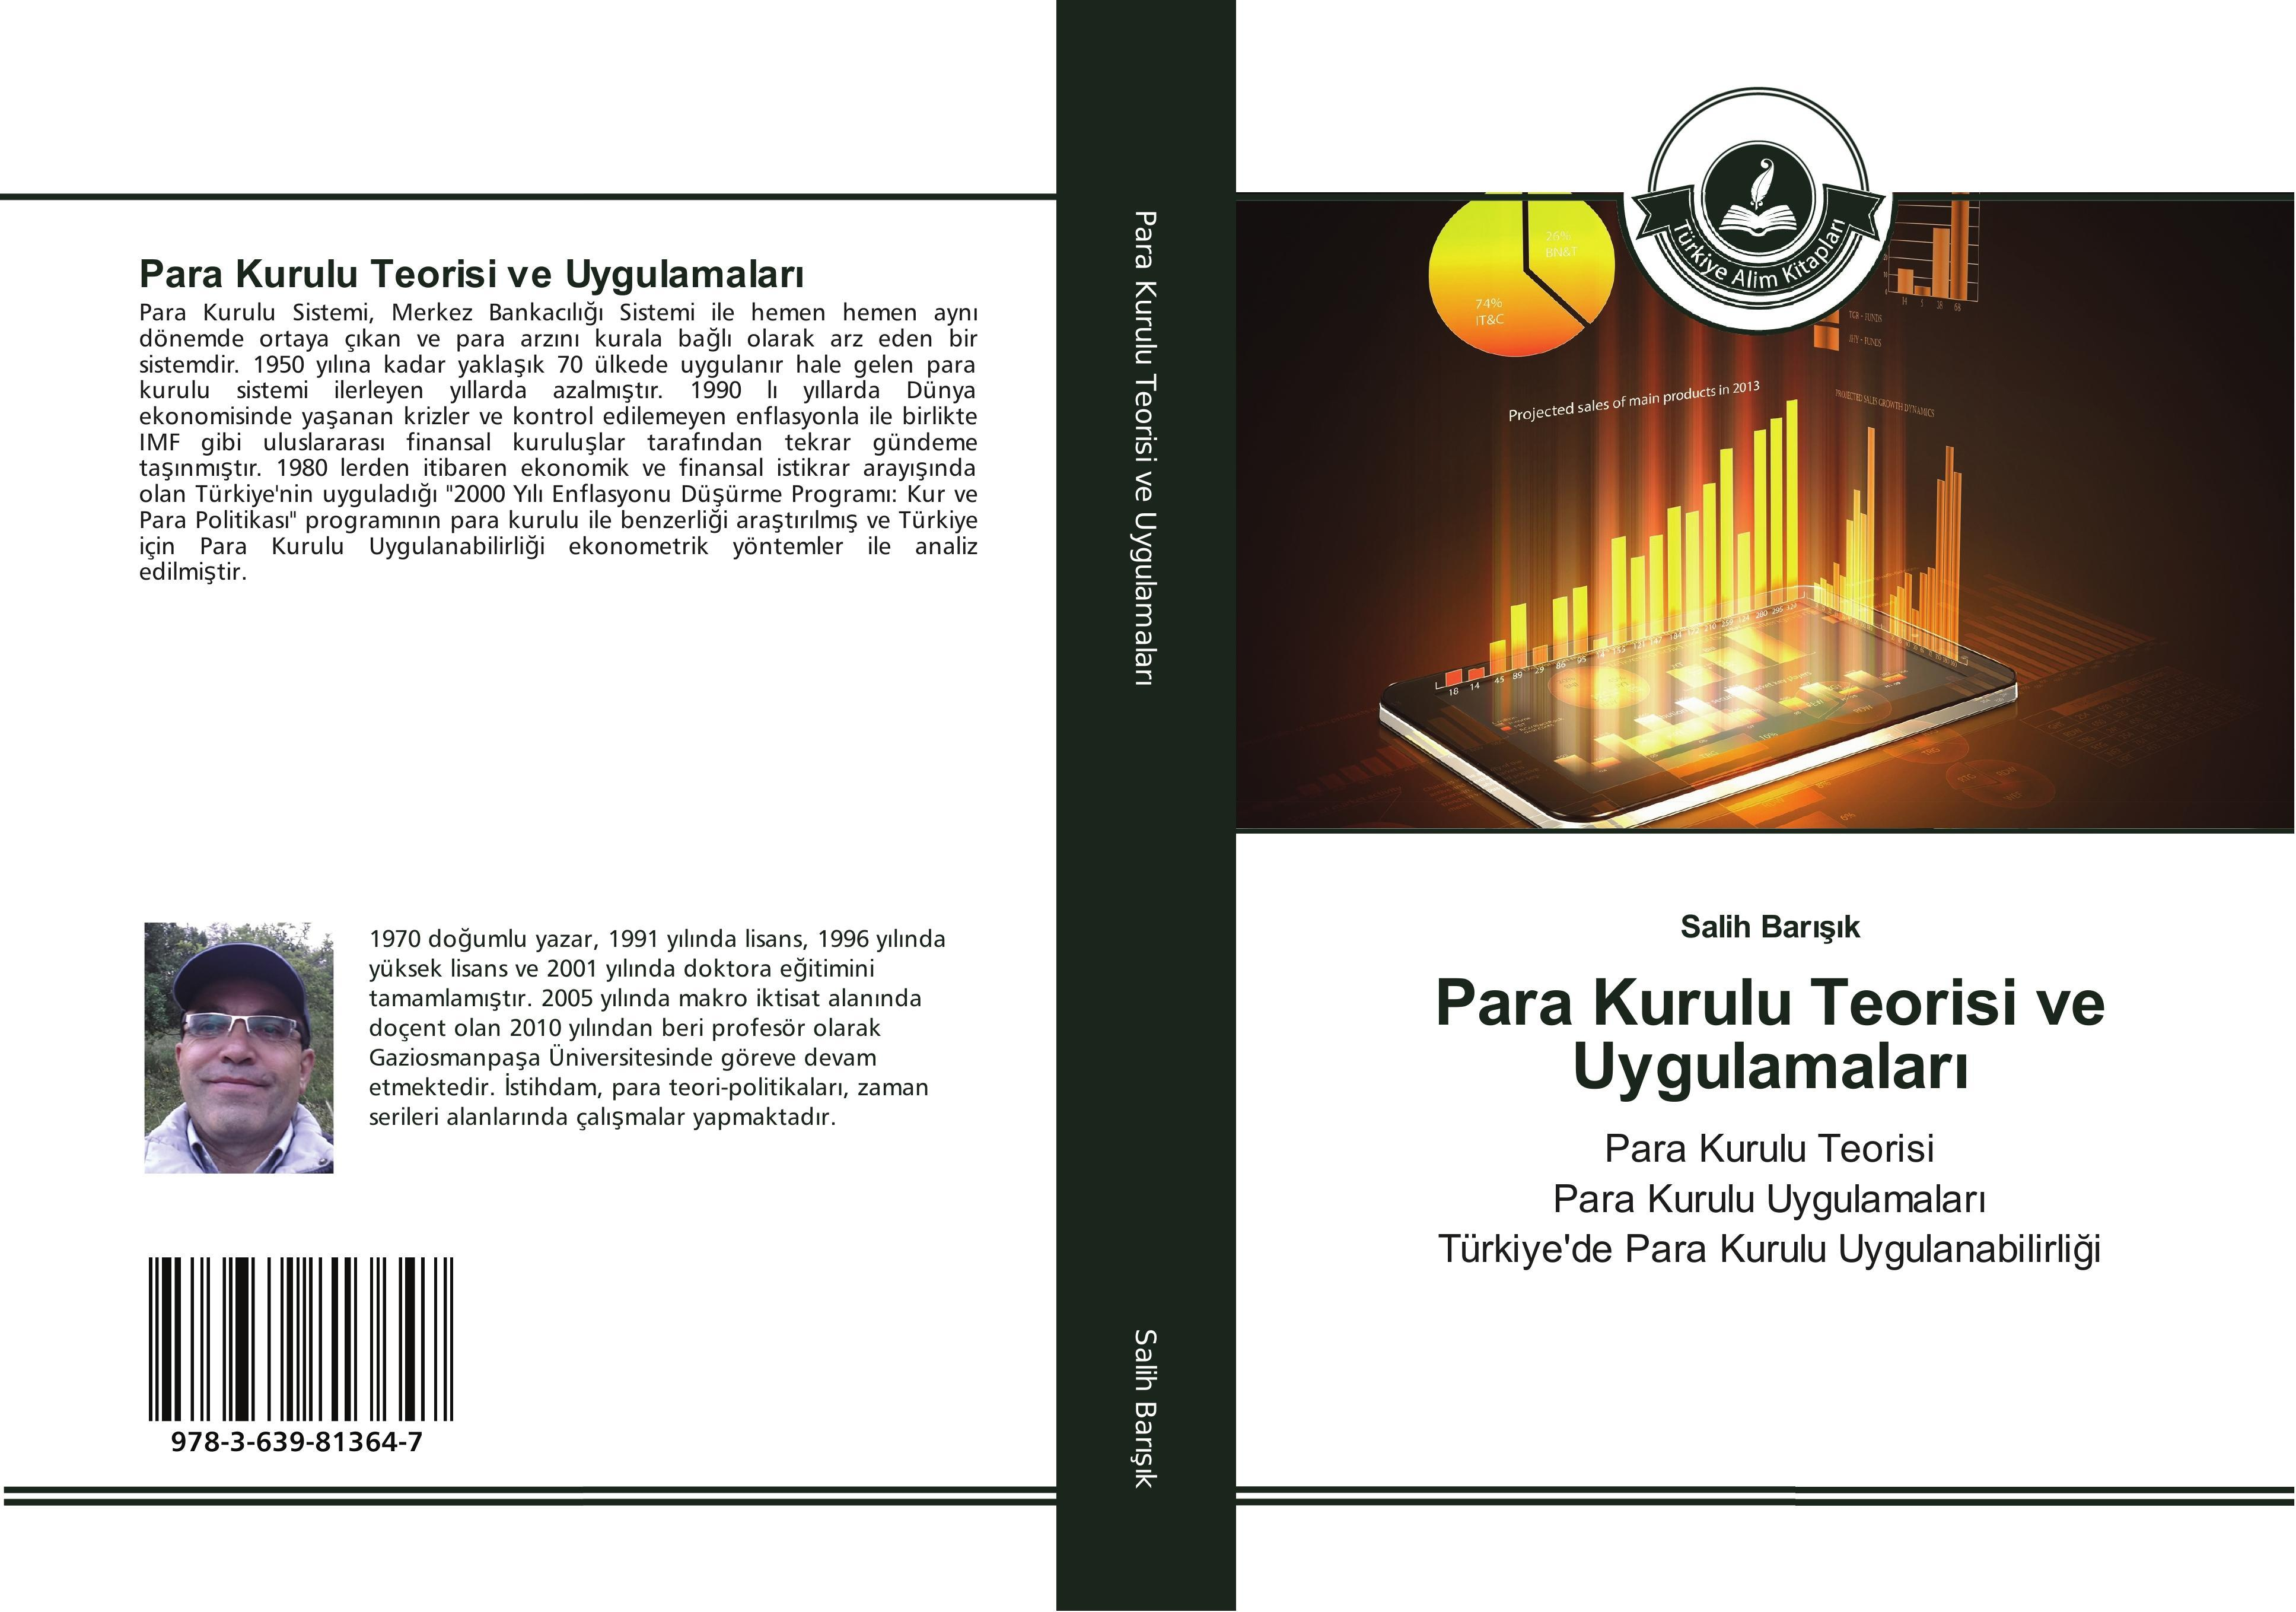 Para Kurulu Teorisi ve Uygulamalari - Salih Barisik -  9783639813647